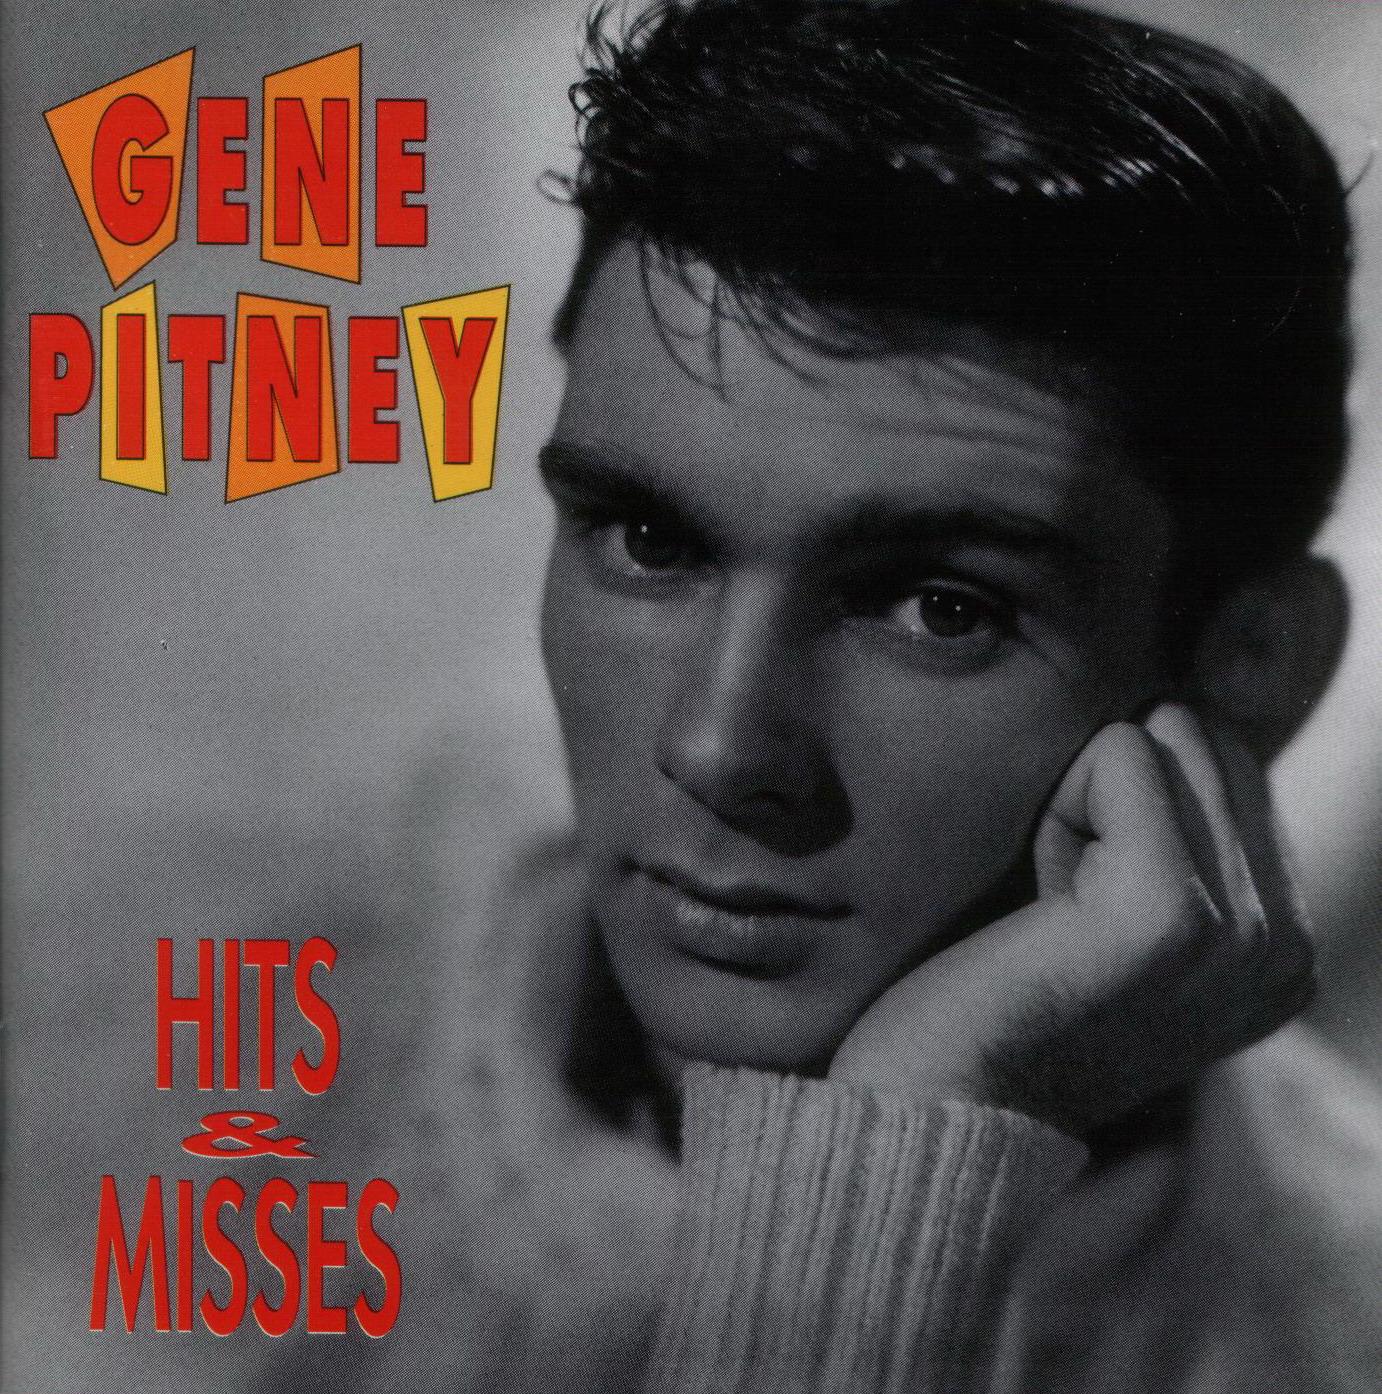 Rock On Gene Pitney